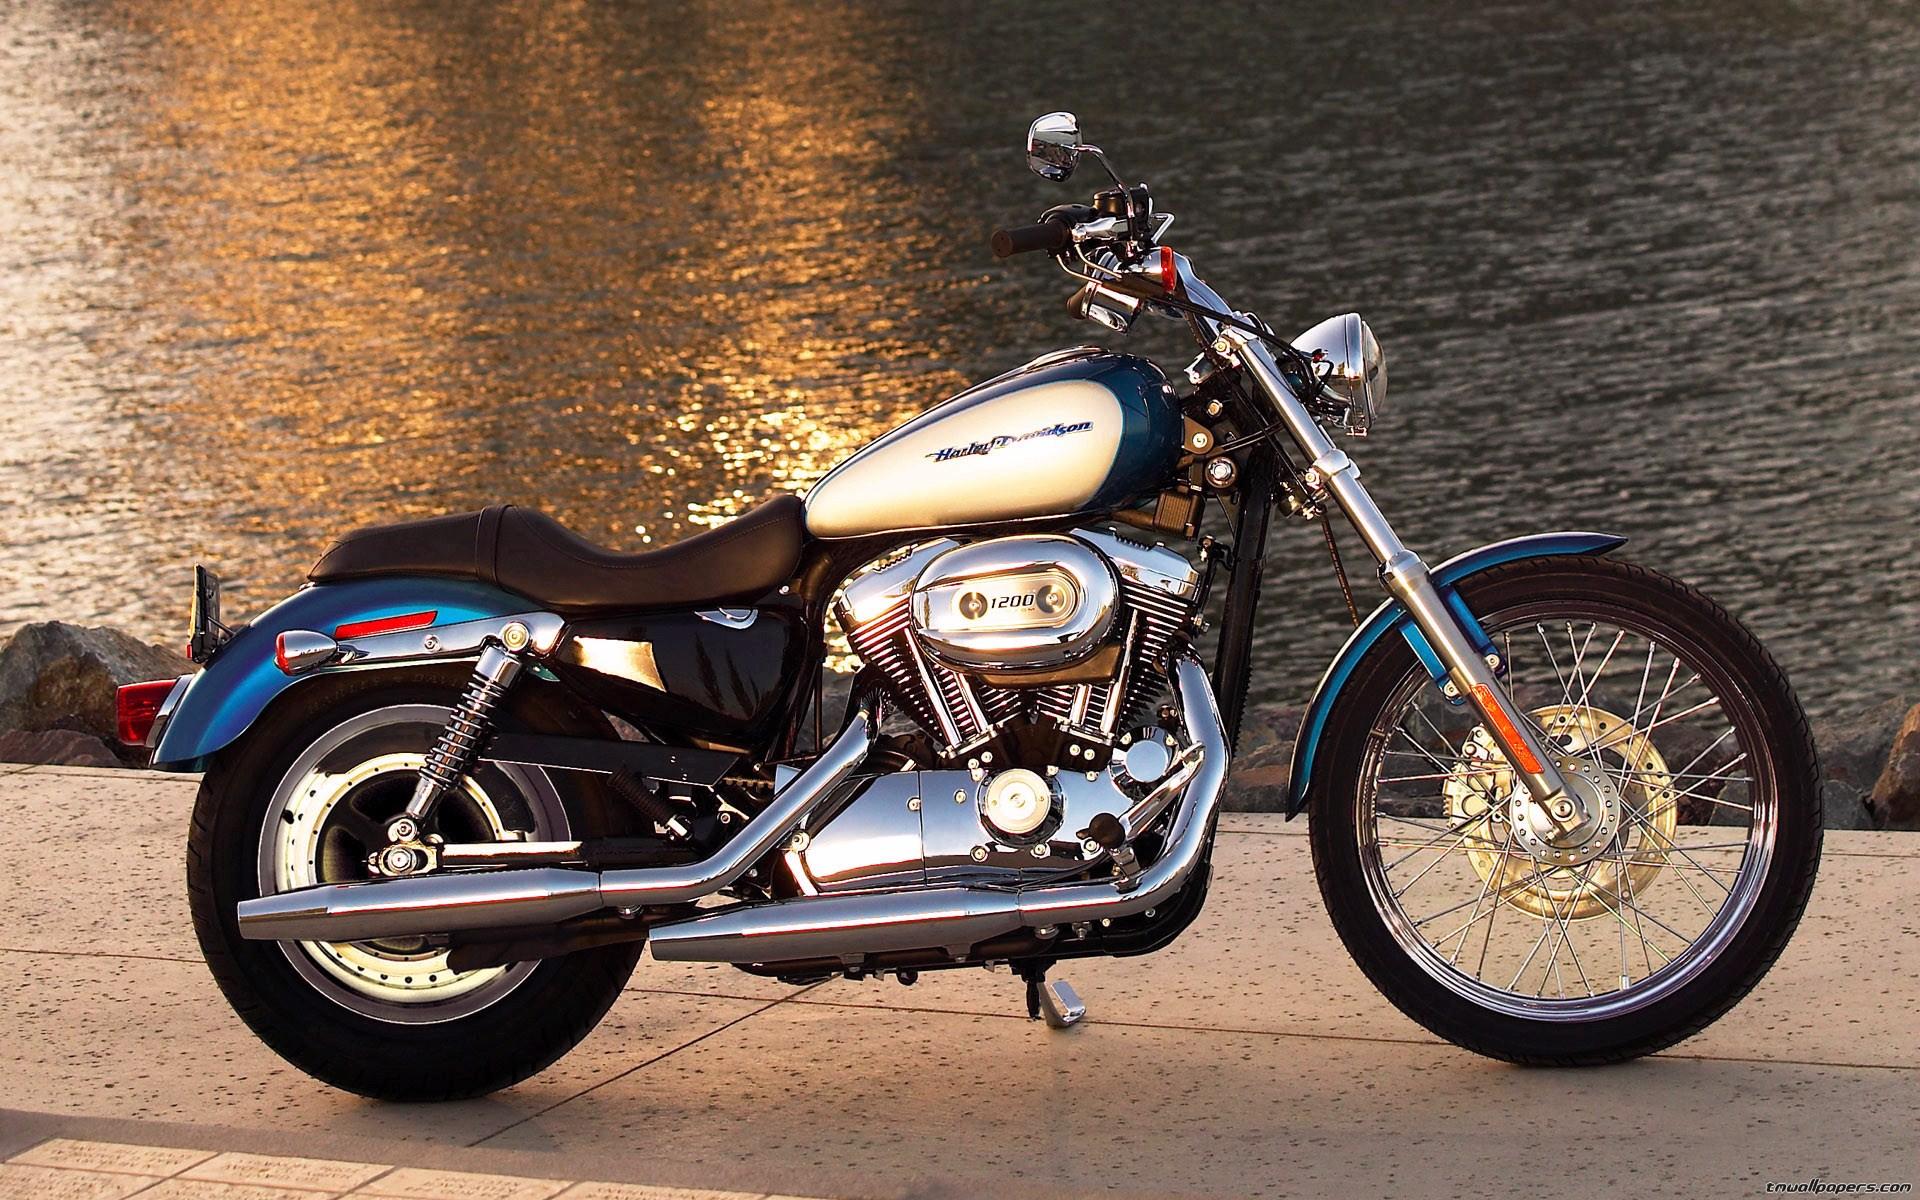 Harley Davidson Bikes wallpaper   839846 1920x1200